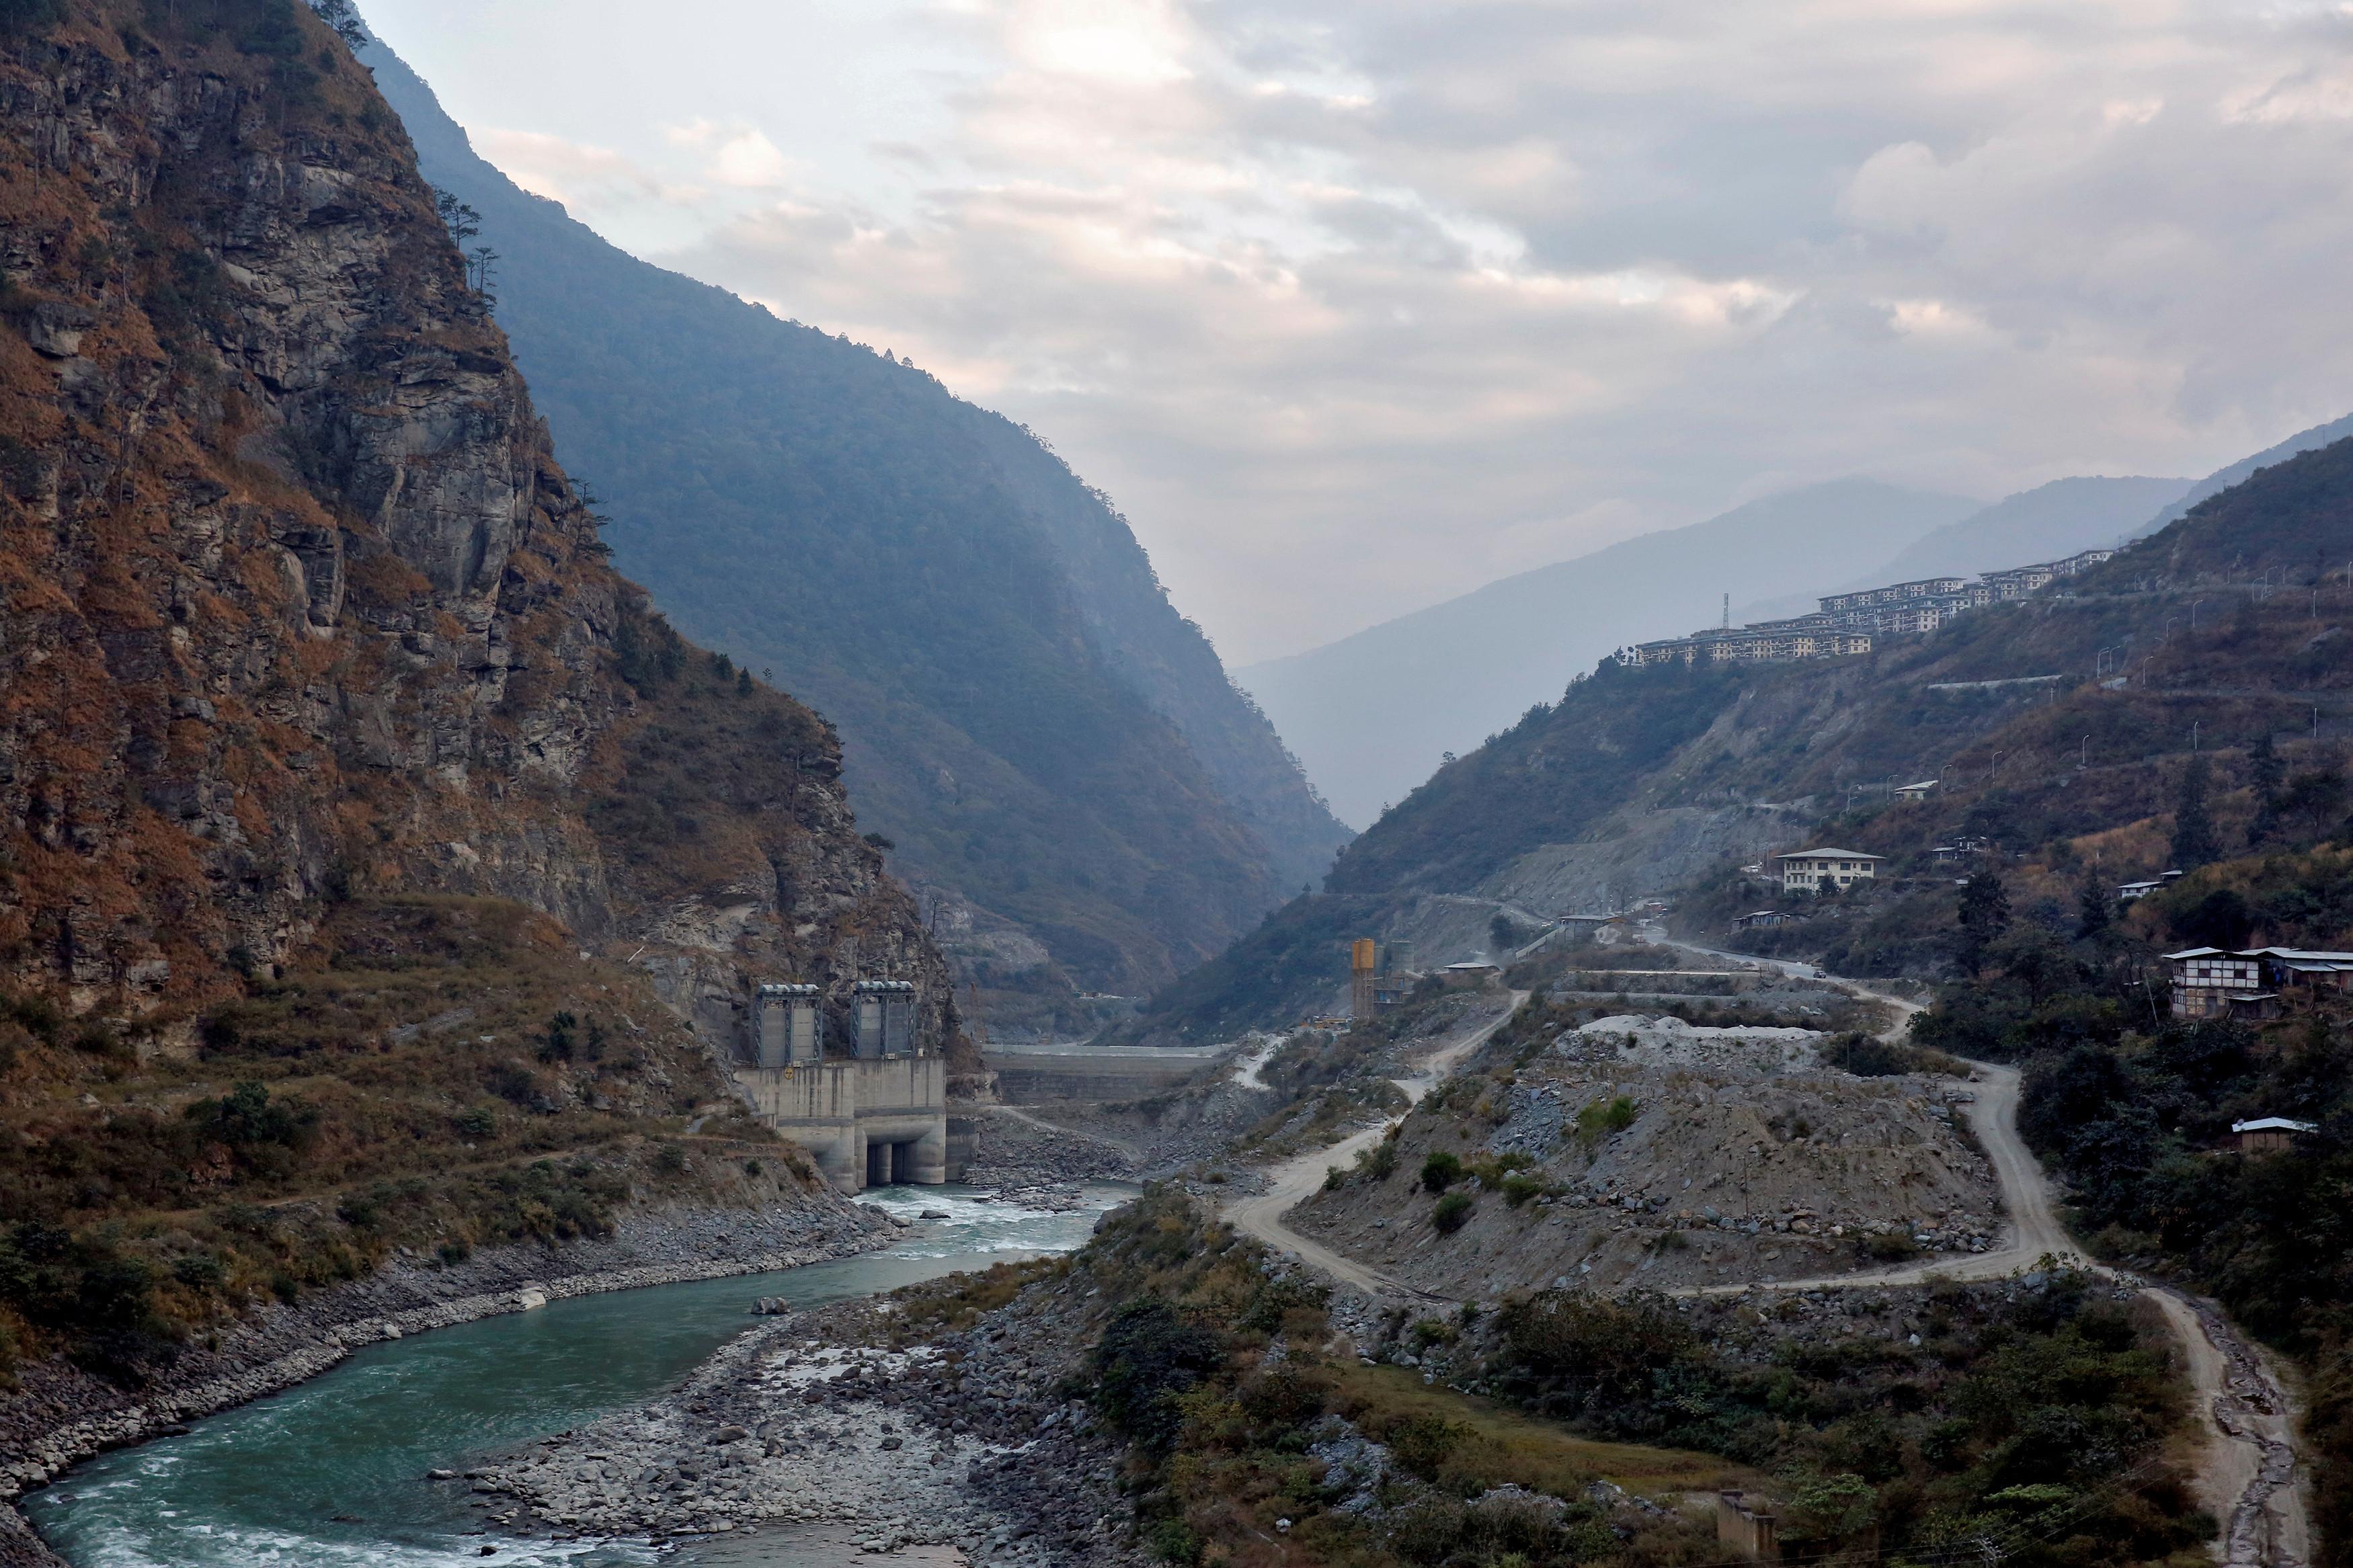 The Punatsangchu hydroelectric power project in Bhutan, December 13, 2017